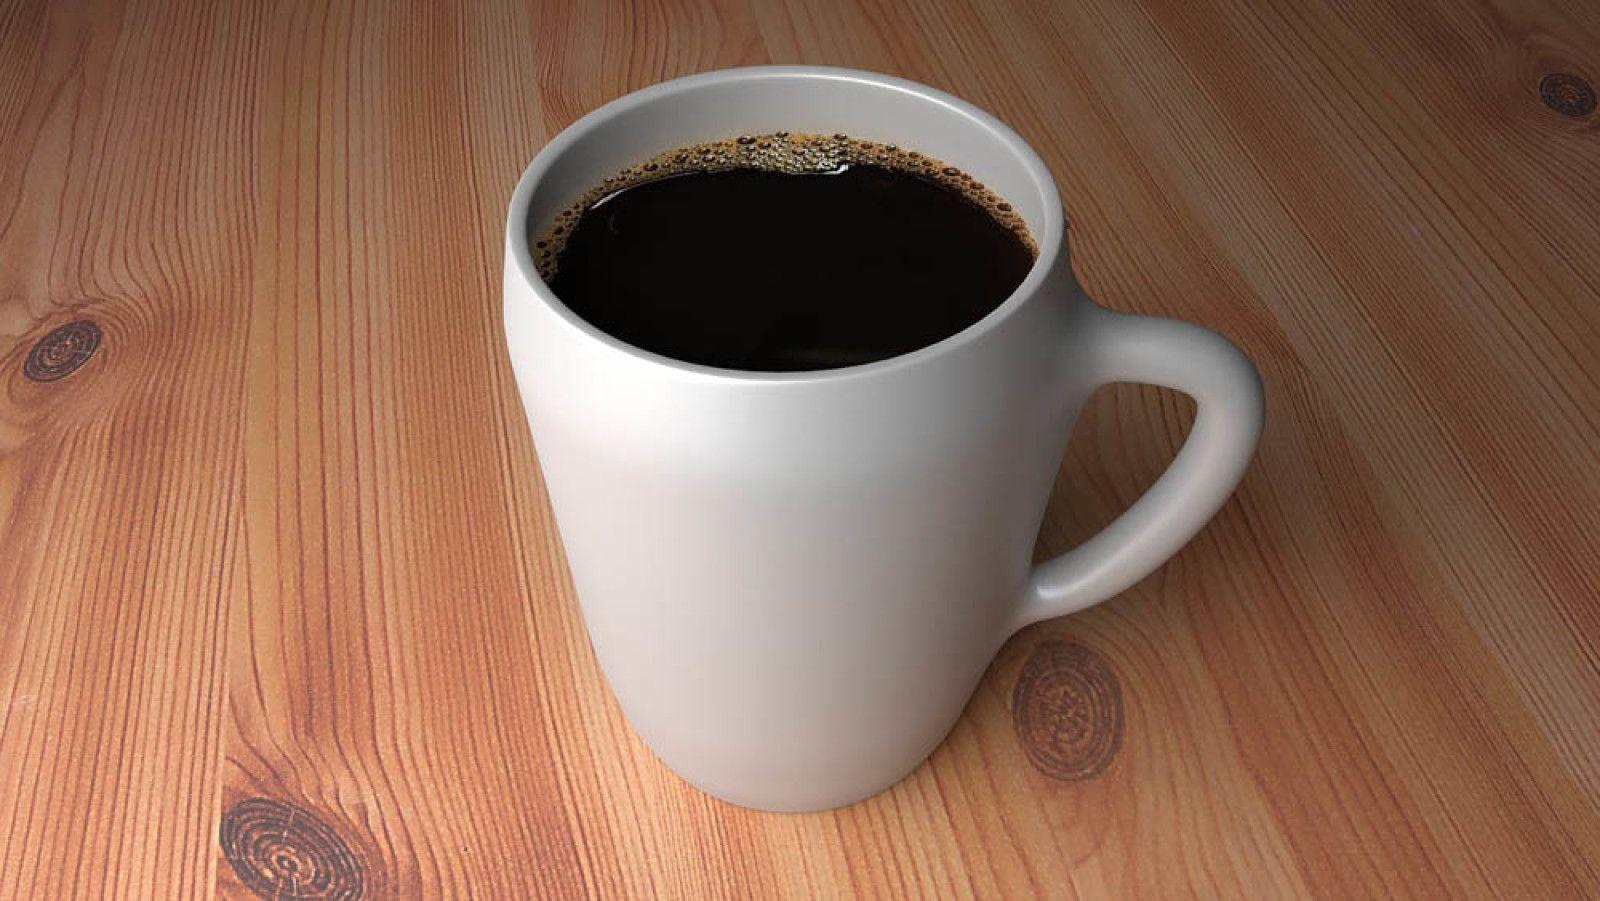 cafea_cskprow43a